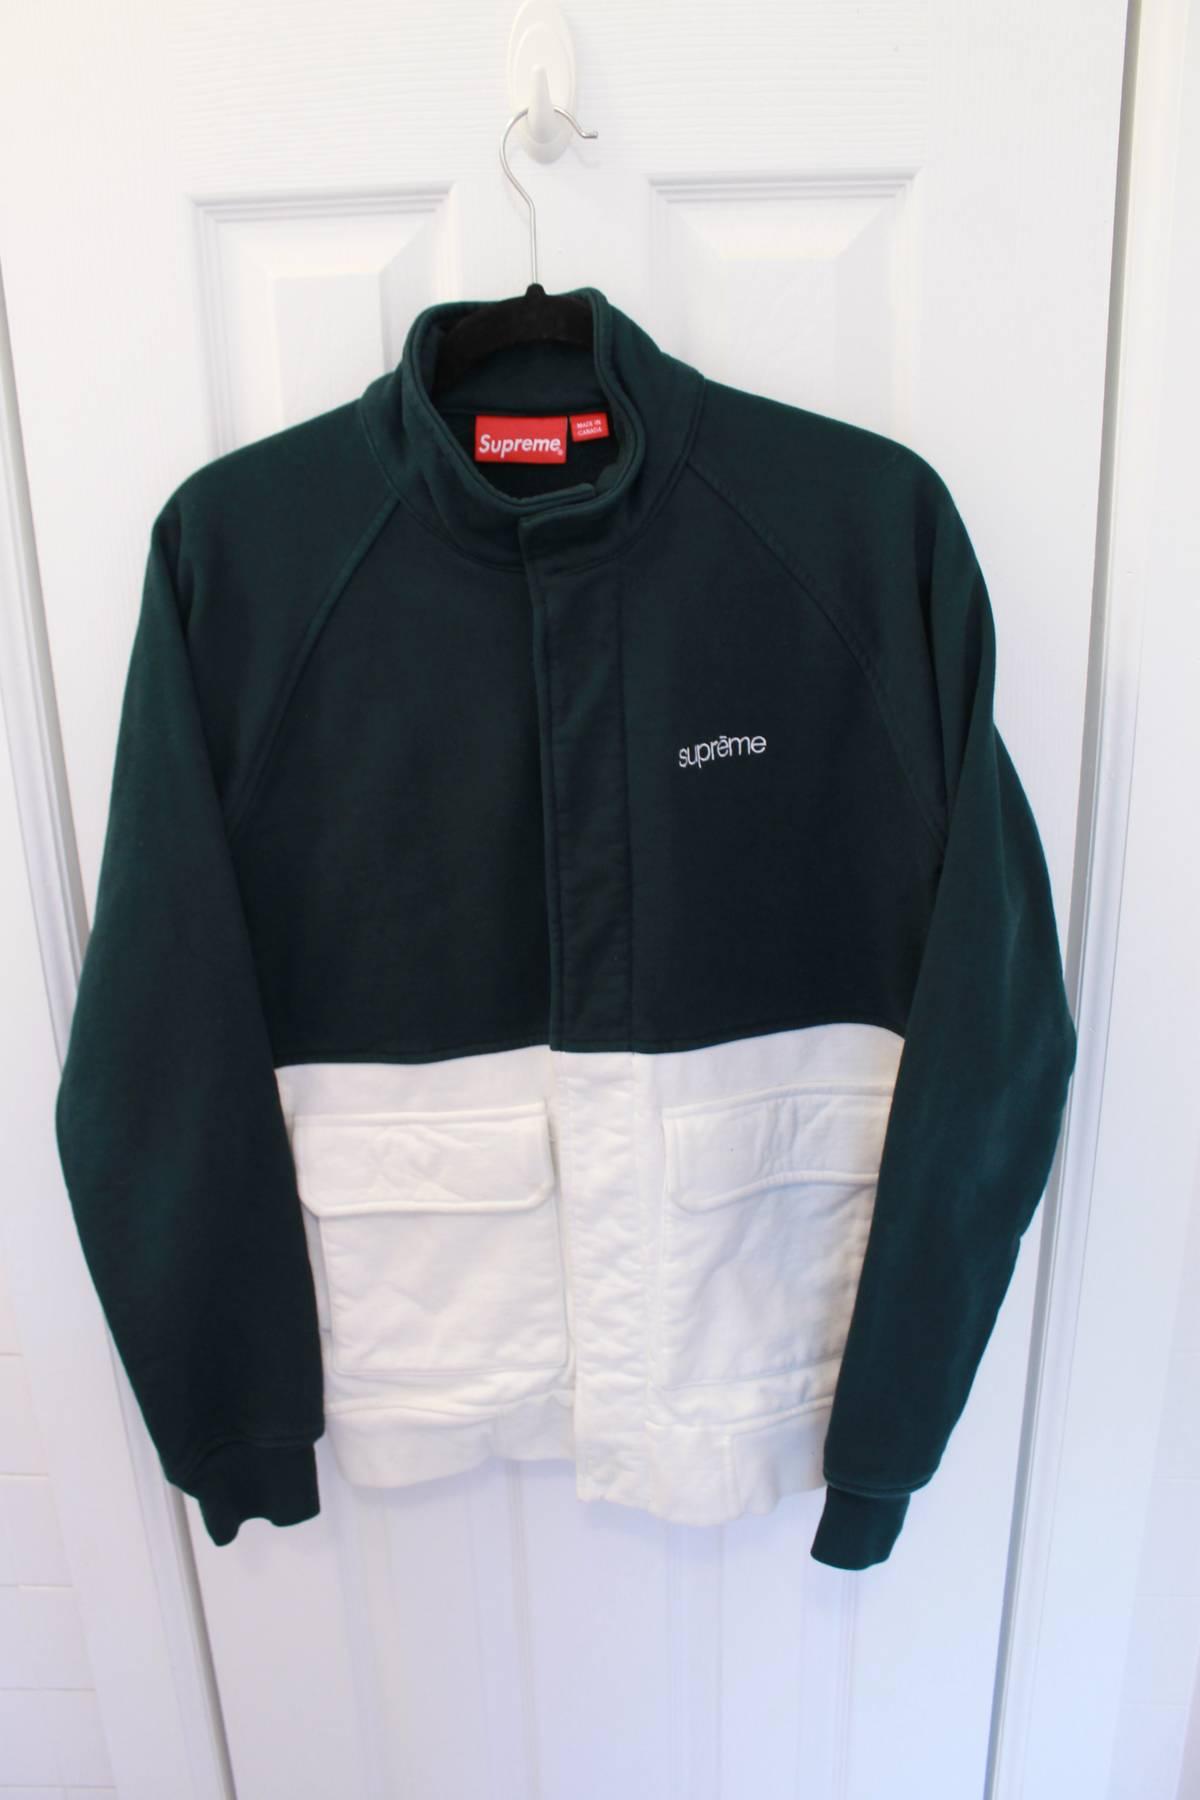 Supreme Fleece Warm Up Jacket Size M Light Jackets For Grailed